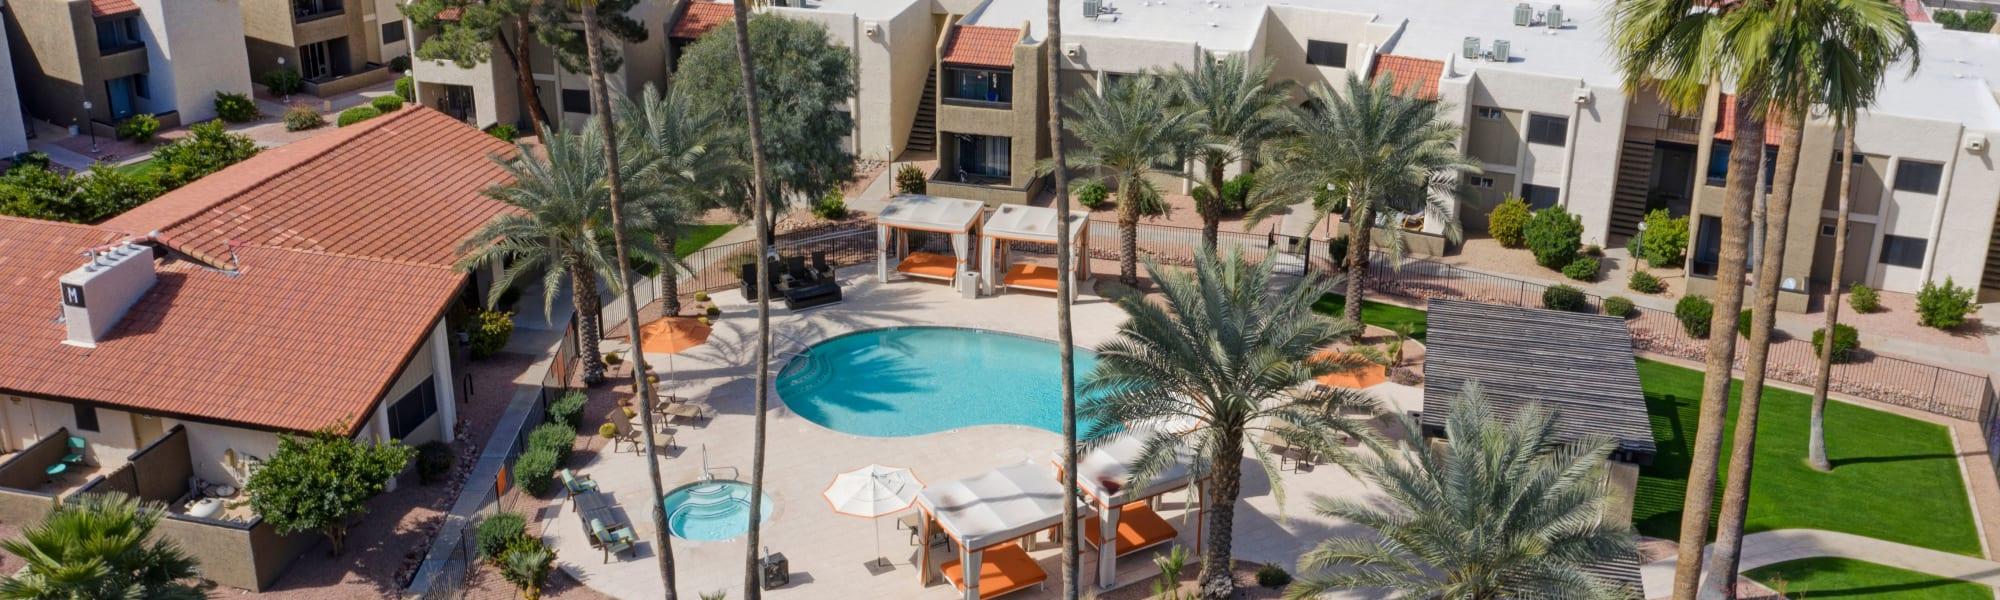 Neighborhood near Avia McCormick Ranch Apartments in Scottsdale, Arizona